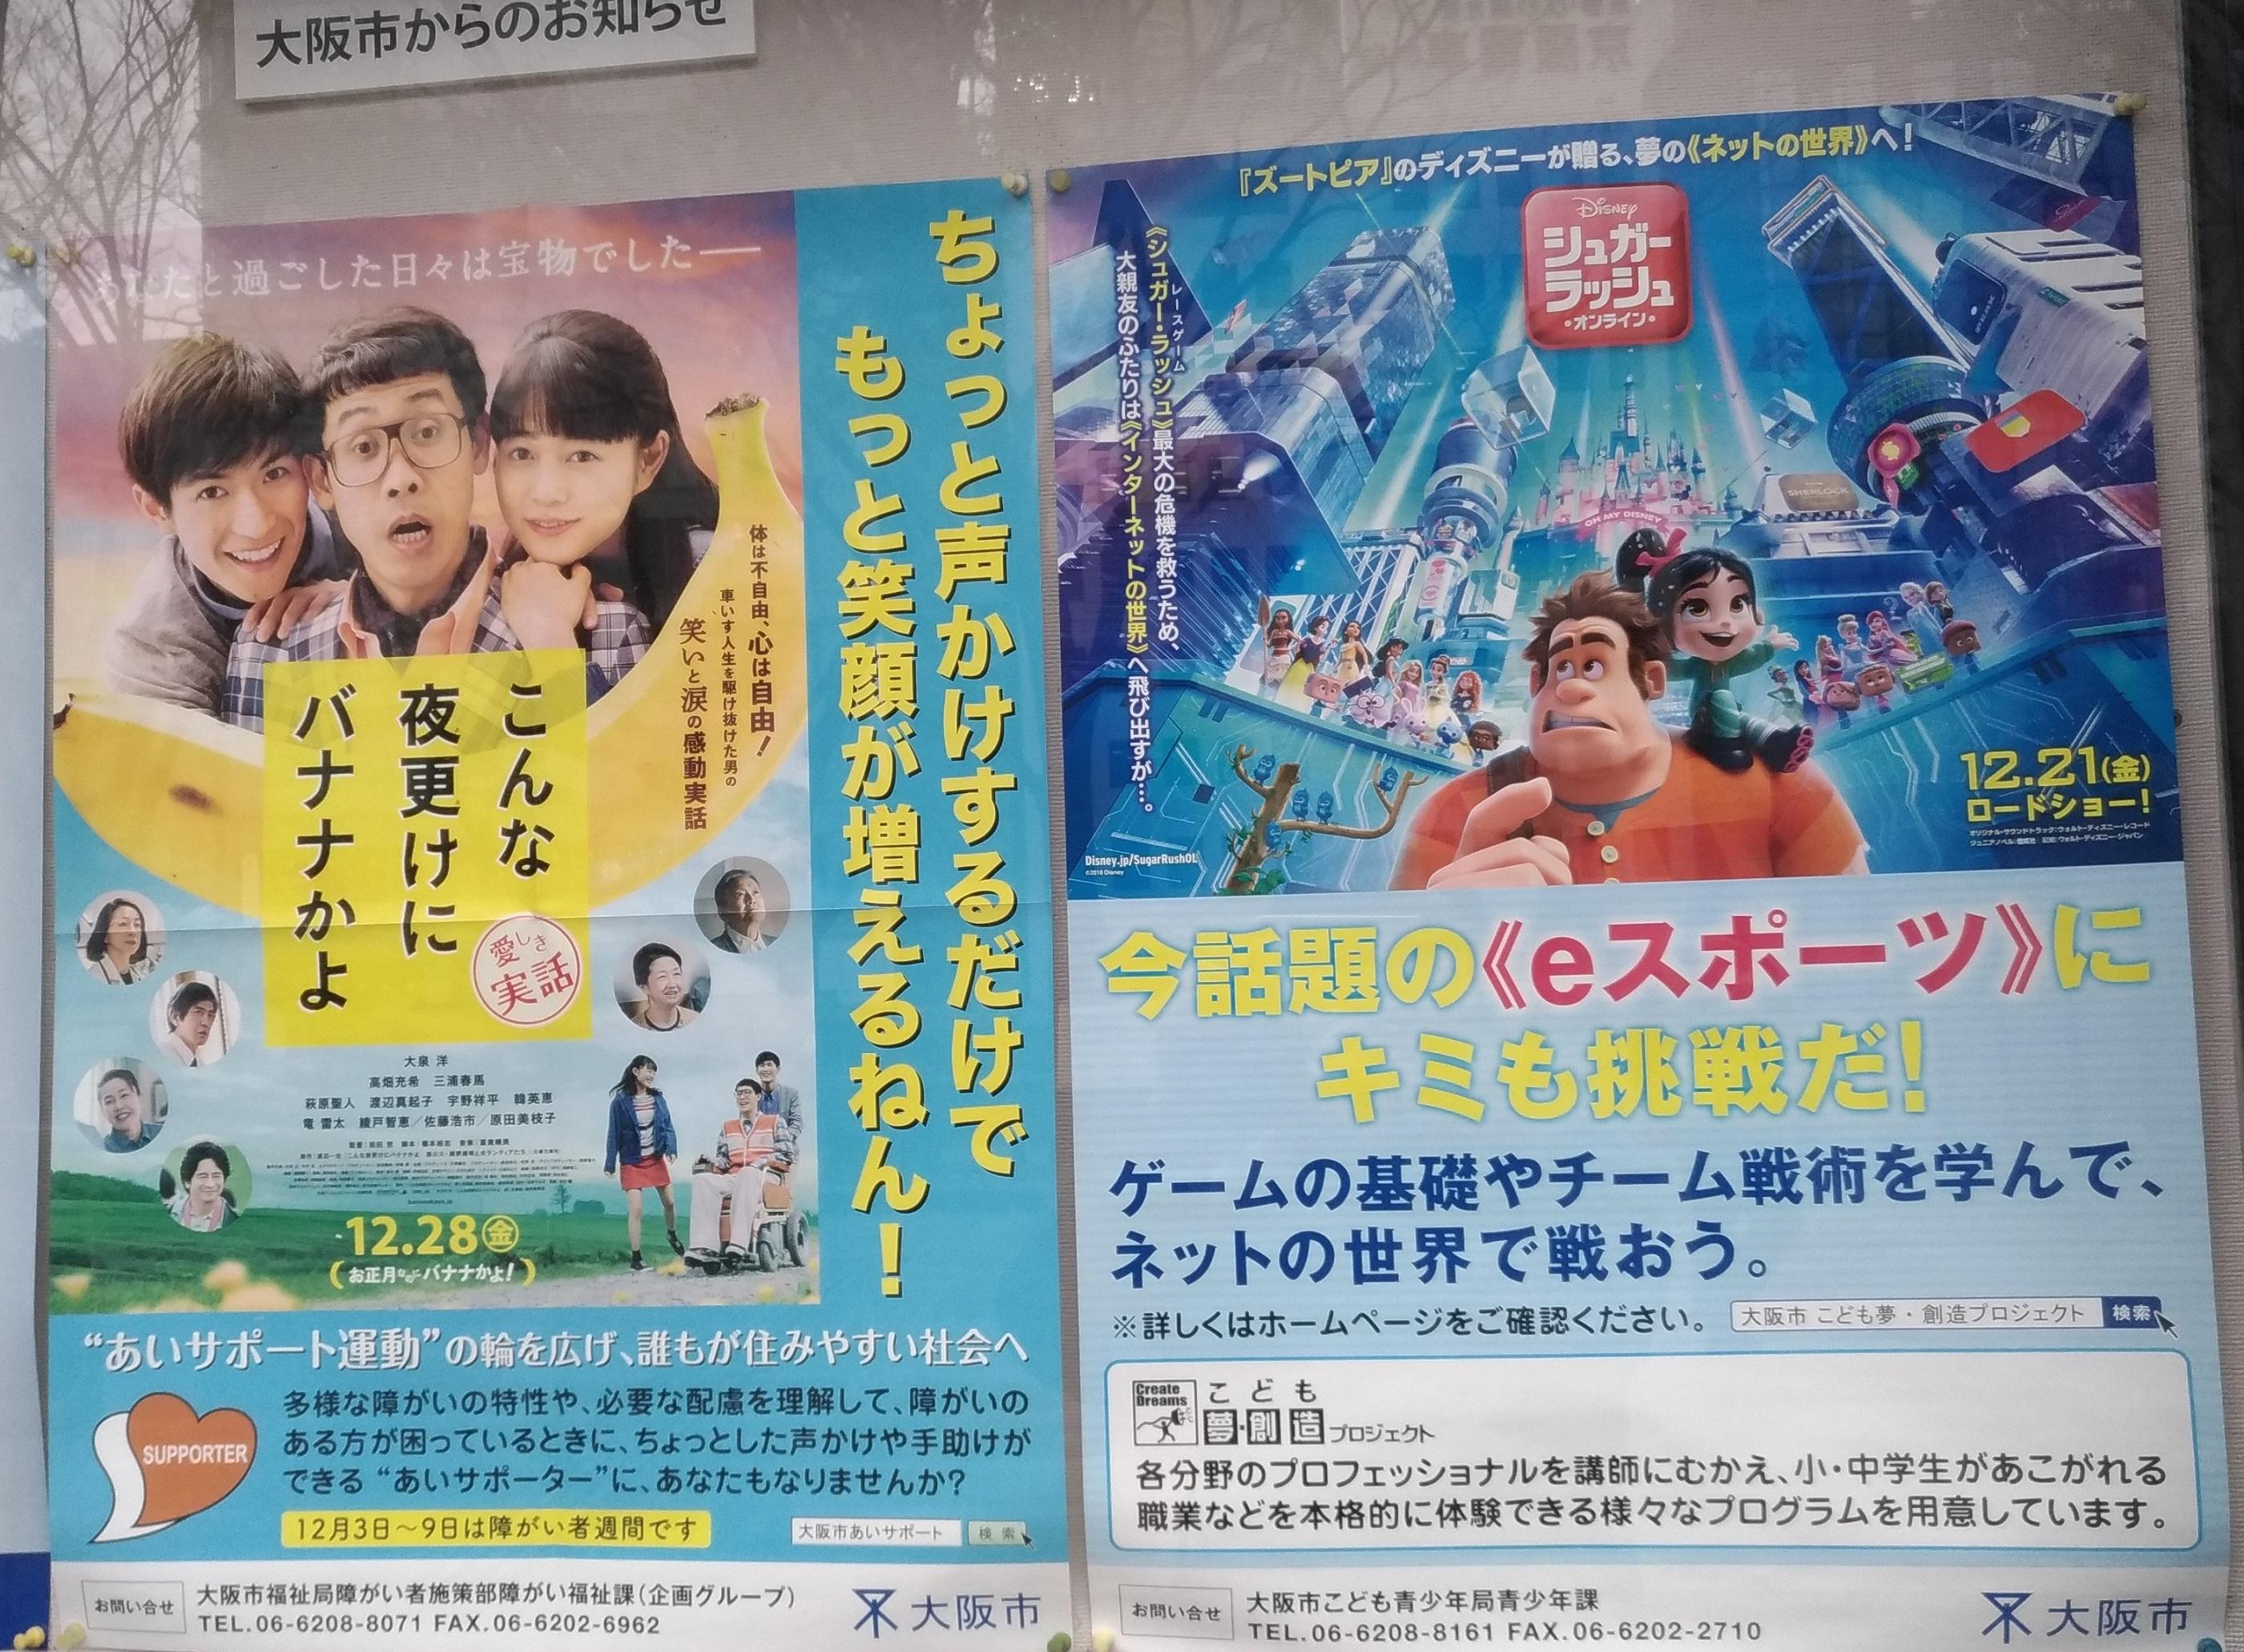 osaka_movies_city.jpg